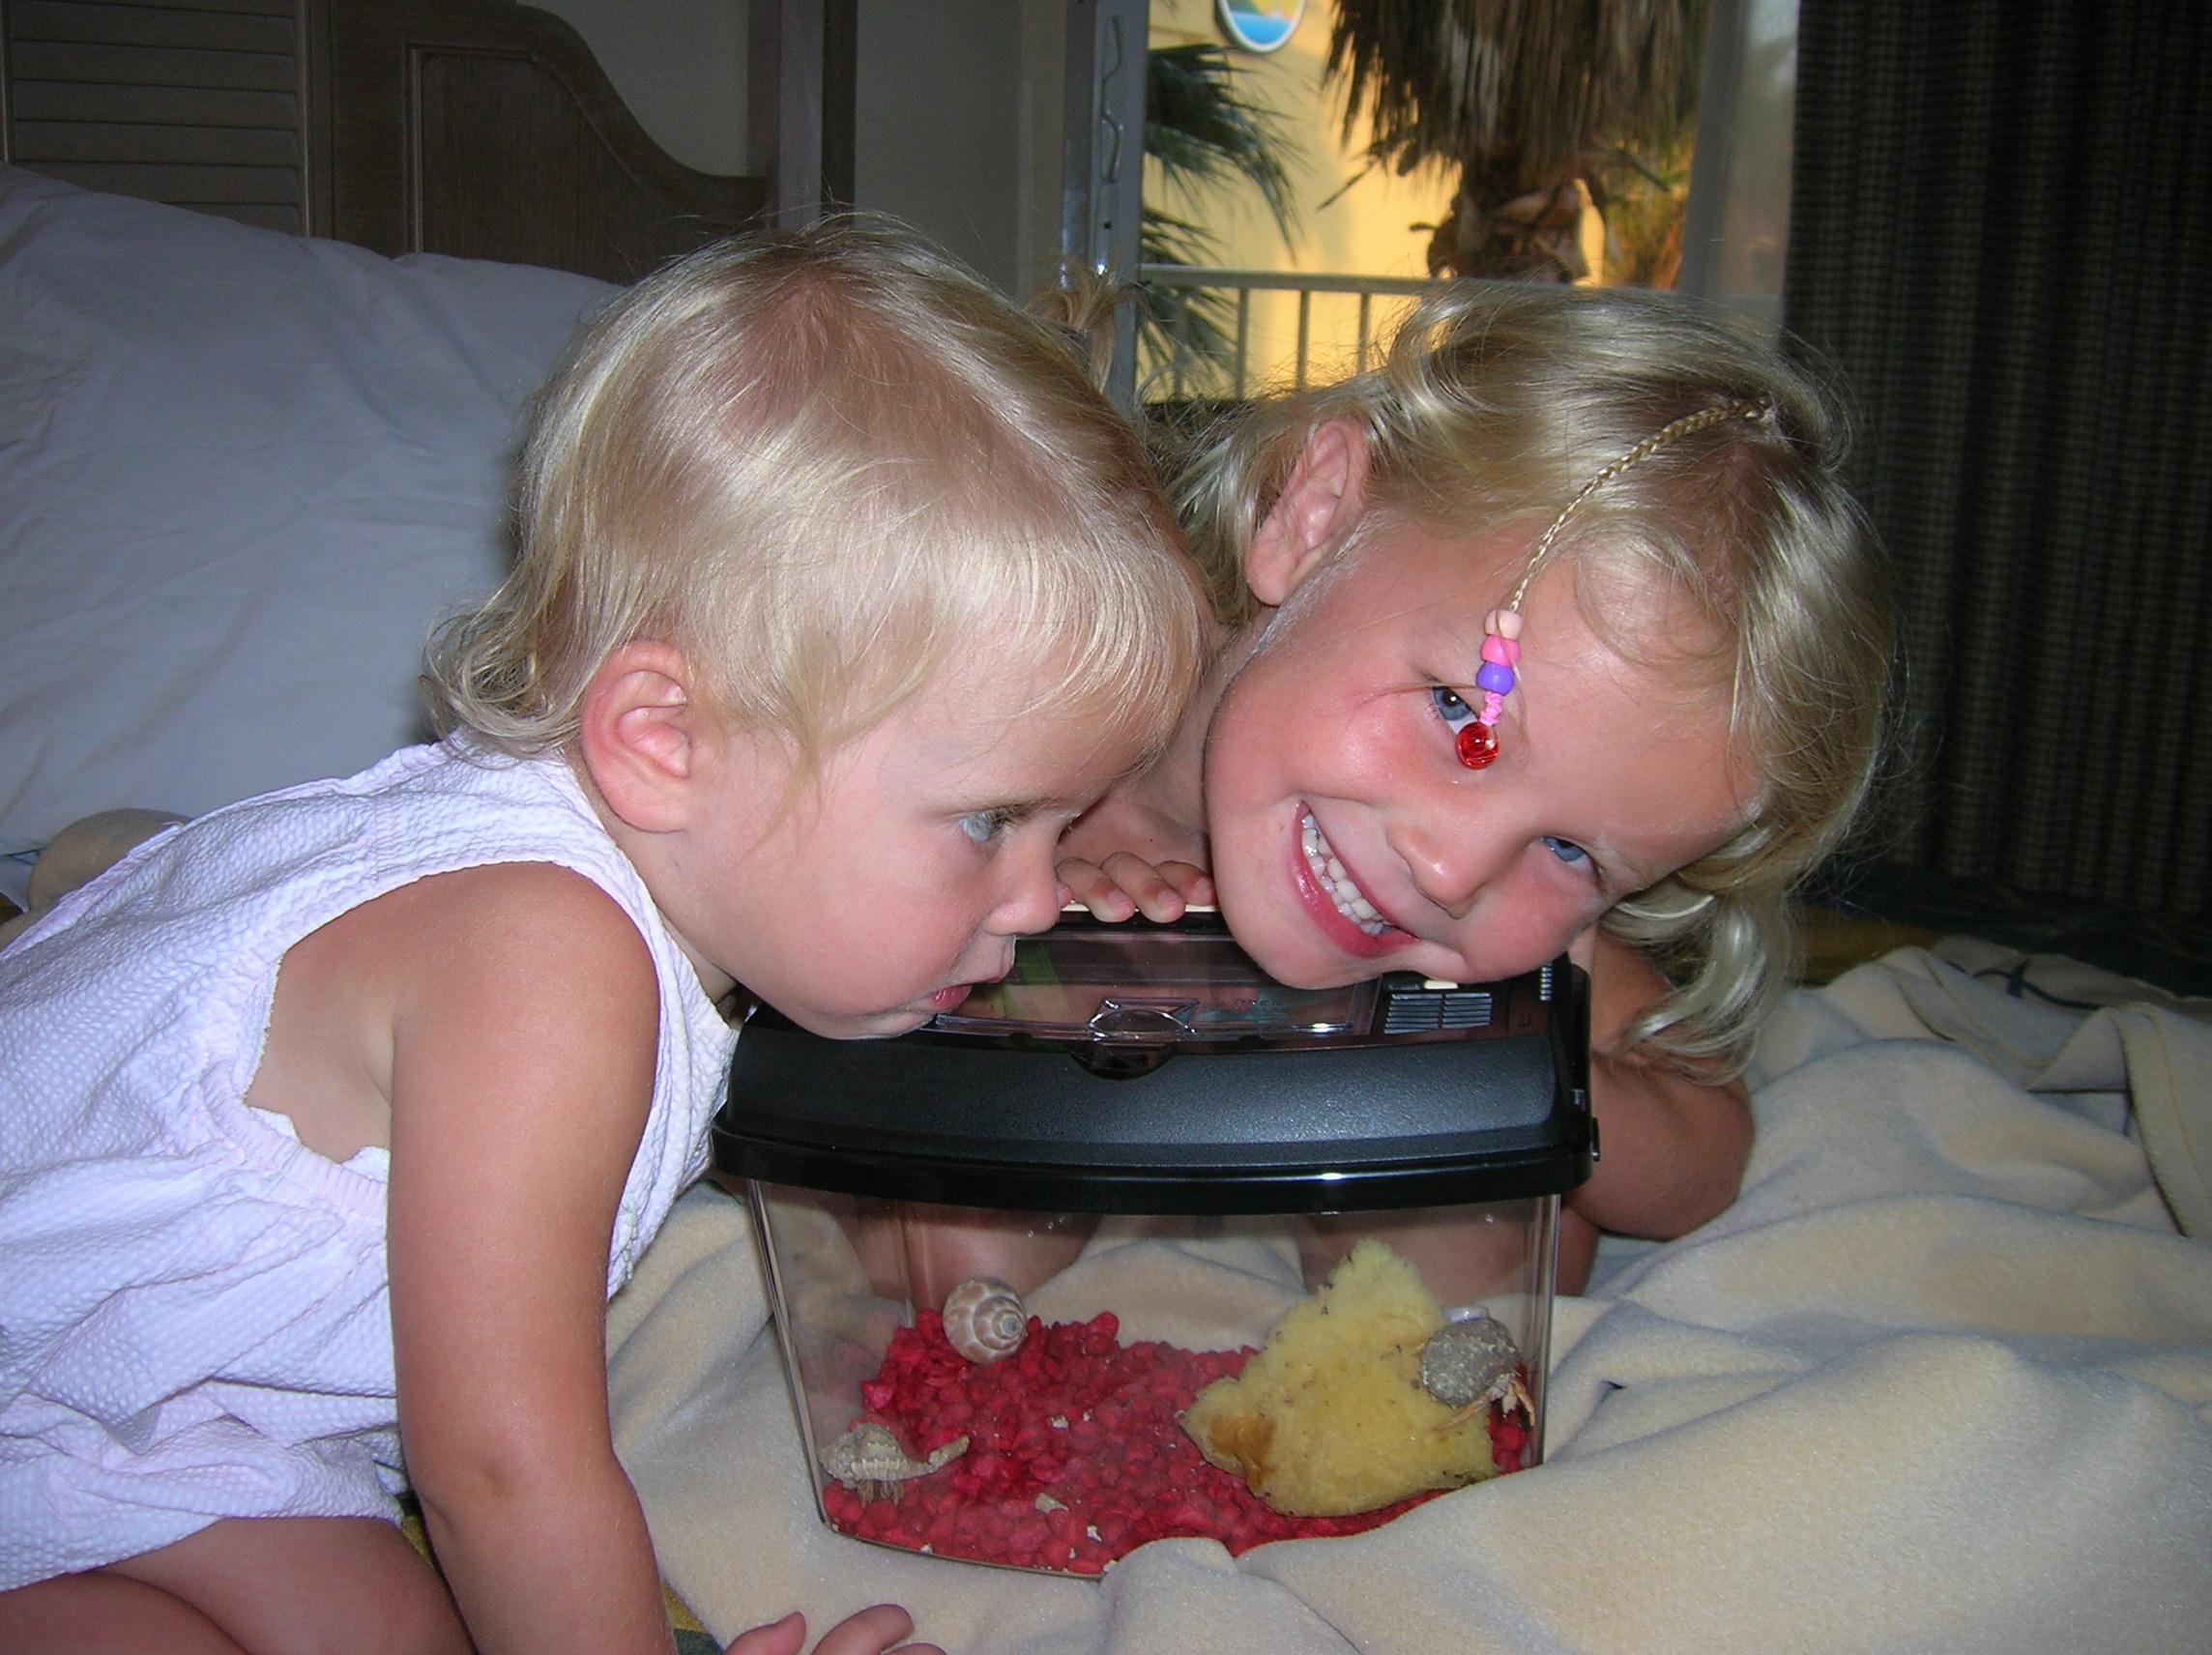 Nana getting a hermit crab...yuck!